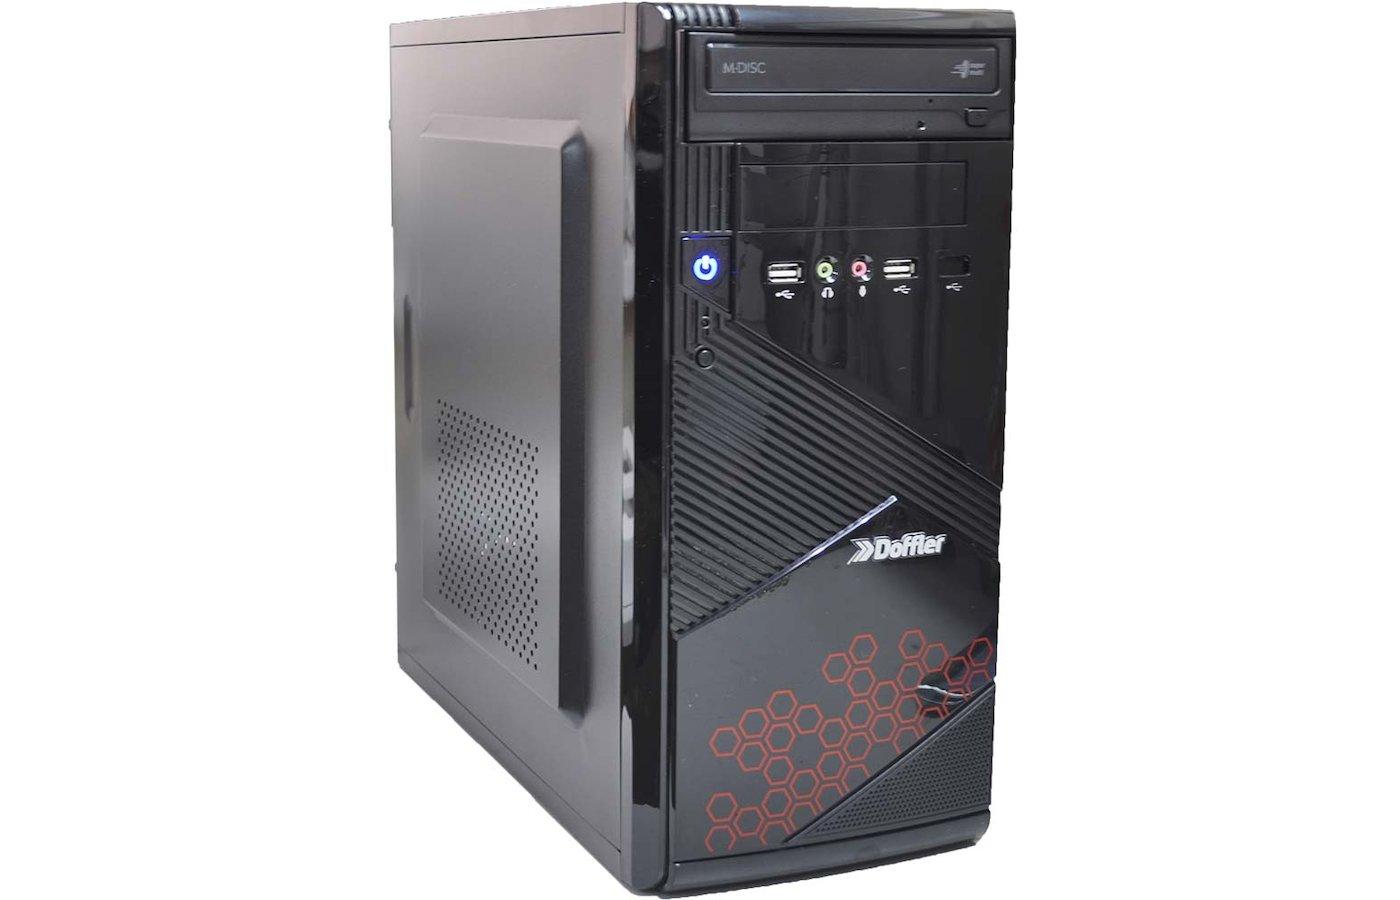 Системный блок Doffler a004 Multimedia AMD A8 7600 x4 3.8Gh/8Gb/500Gb/DVDRW/DOS